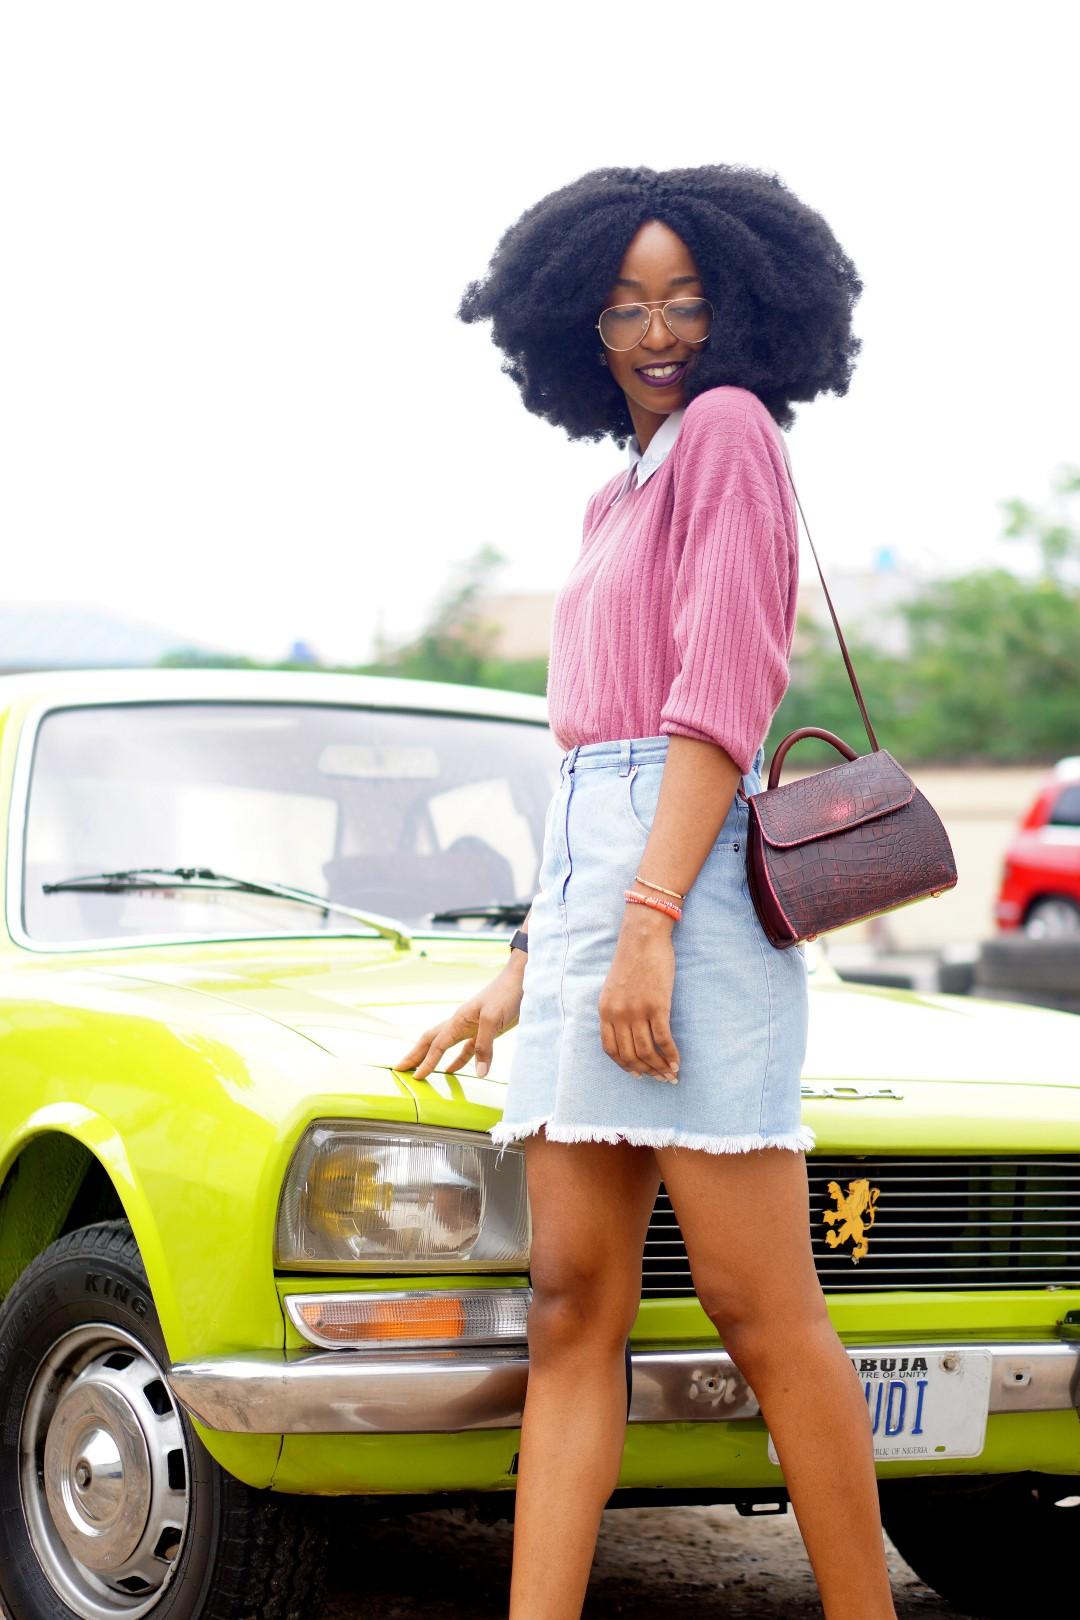 nigerian blogger Cassie daves wearing a denim mini skirt, mauve sweat shirt. leaning against a lemon green peugeot 504